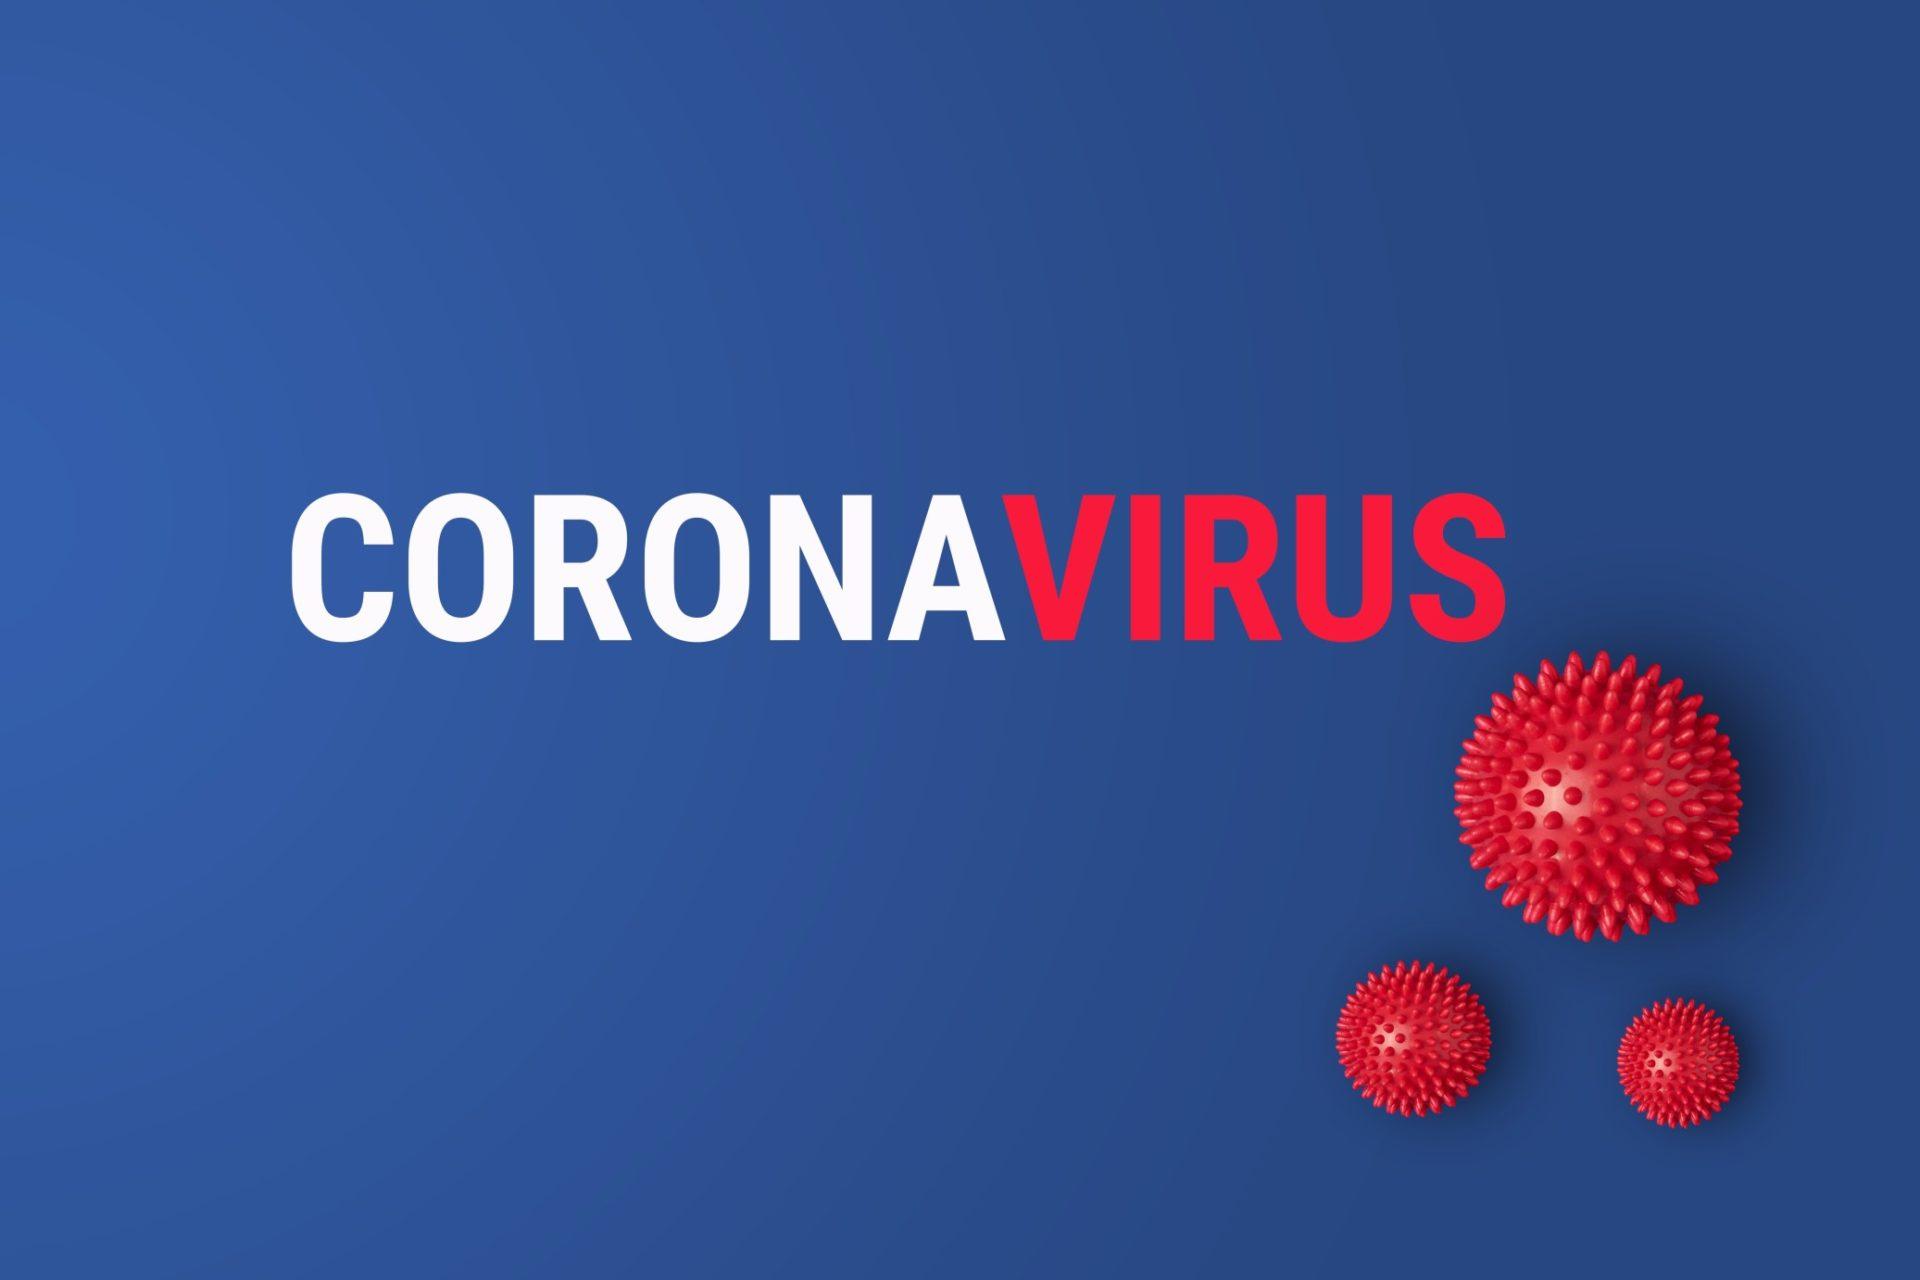 54newcoronaviruscasesreportedindelhi